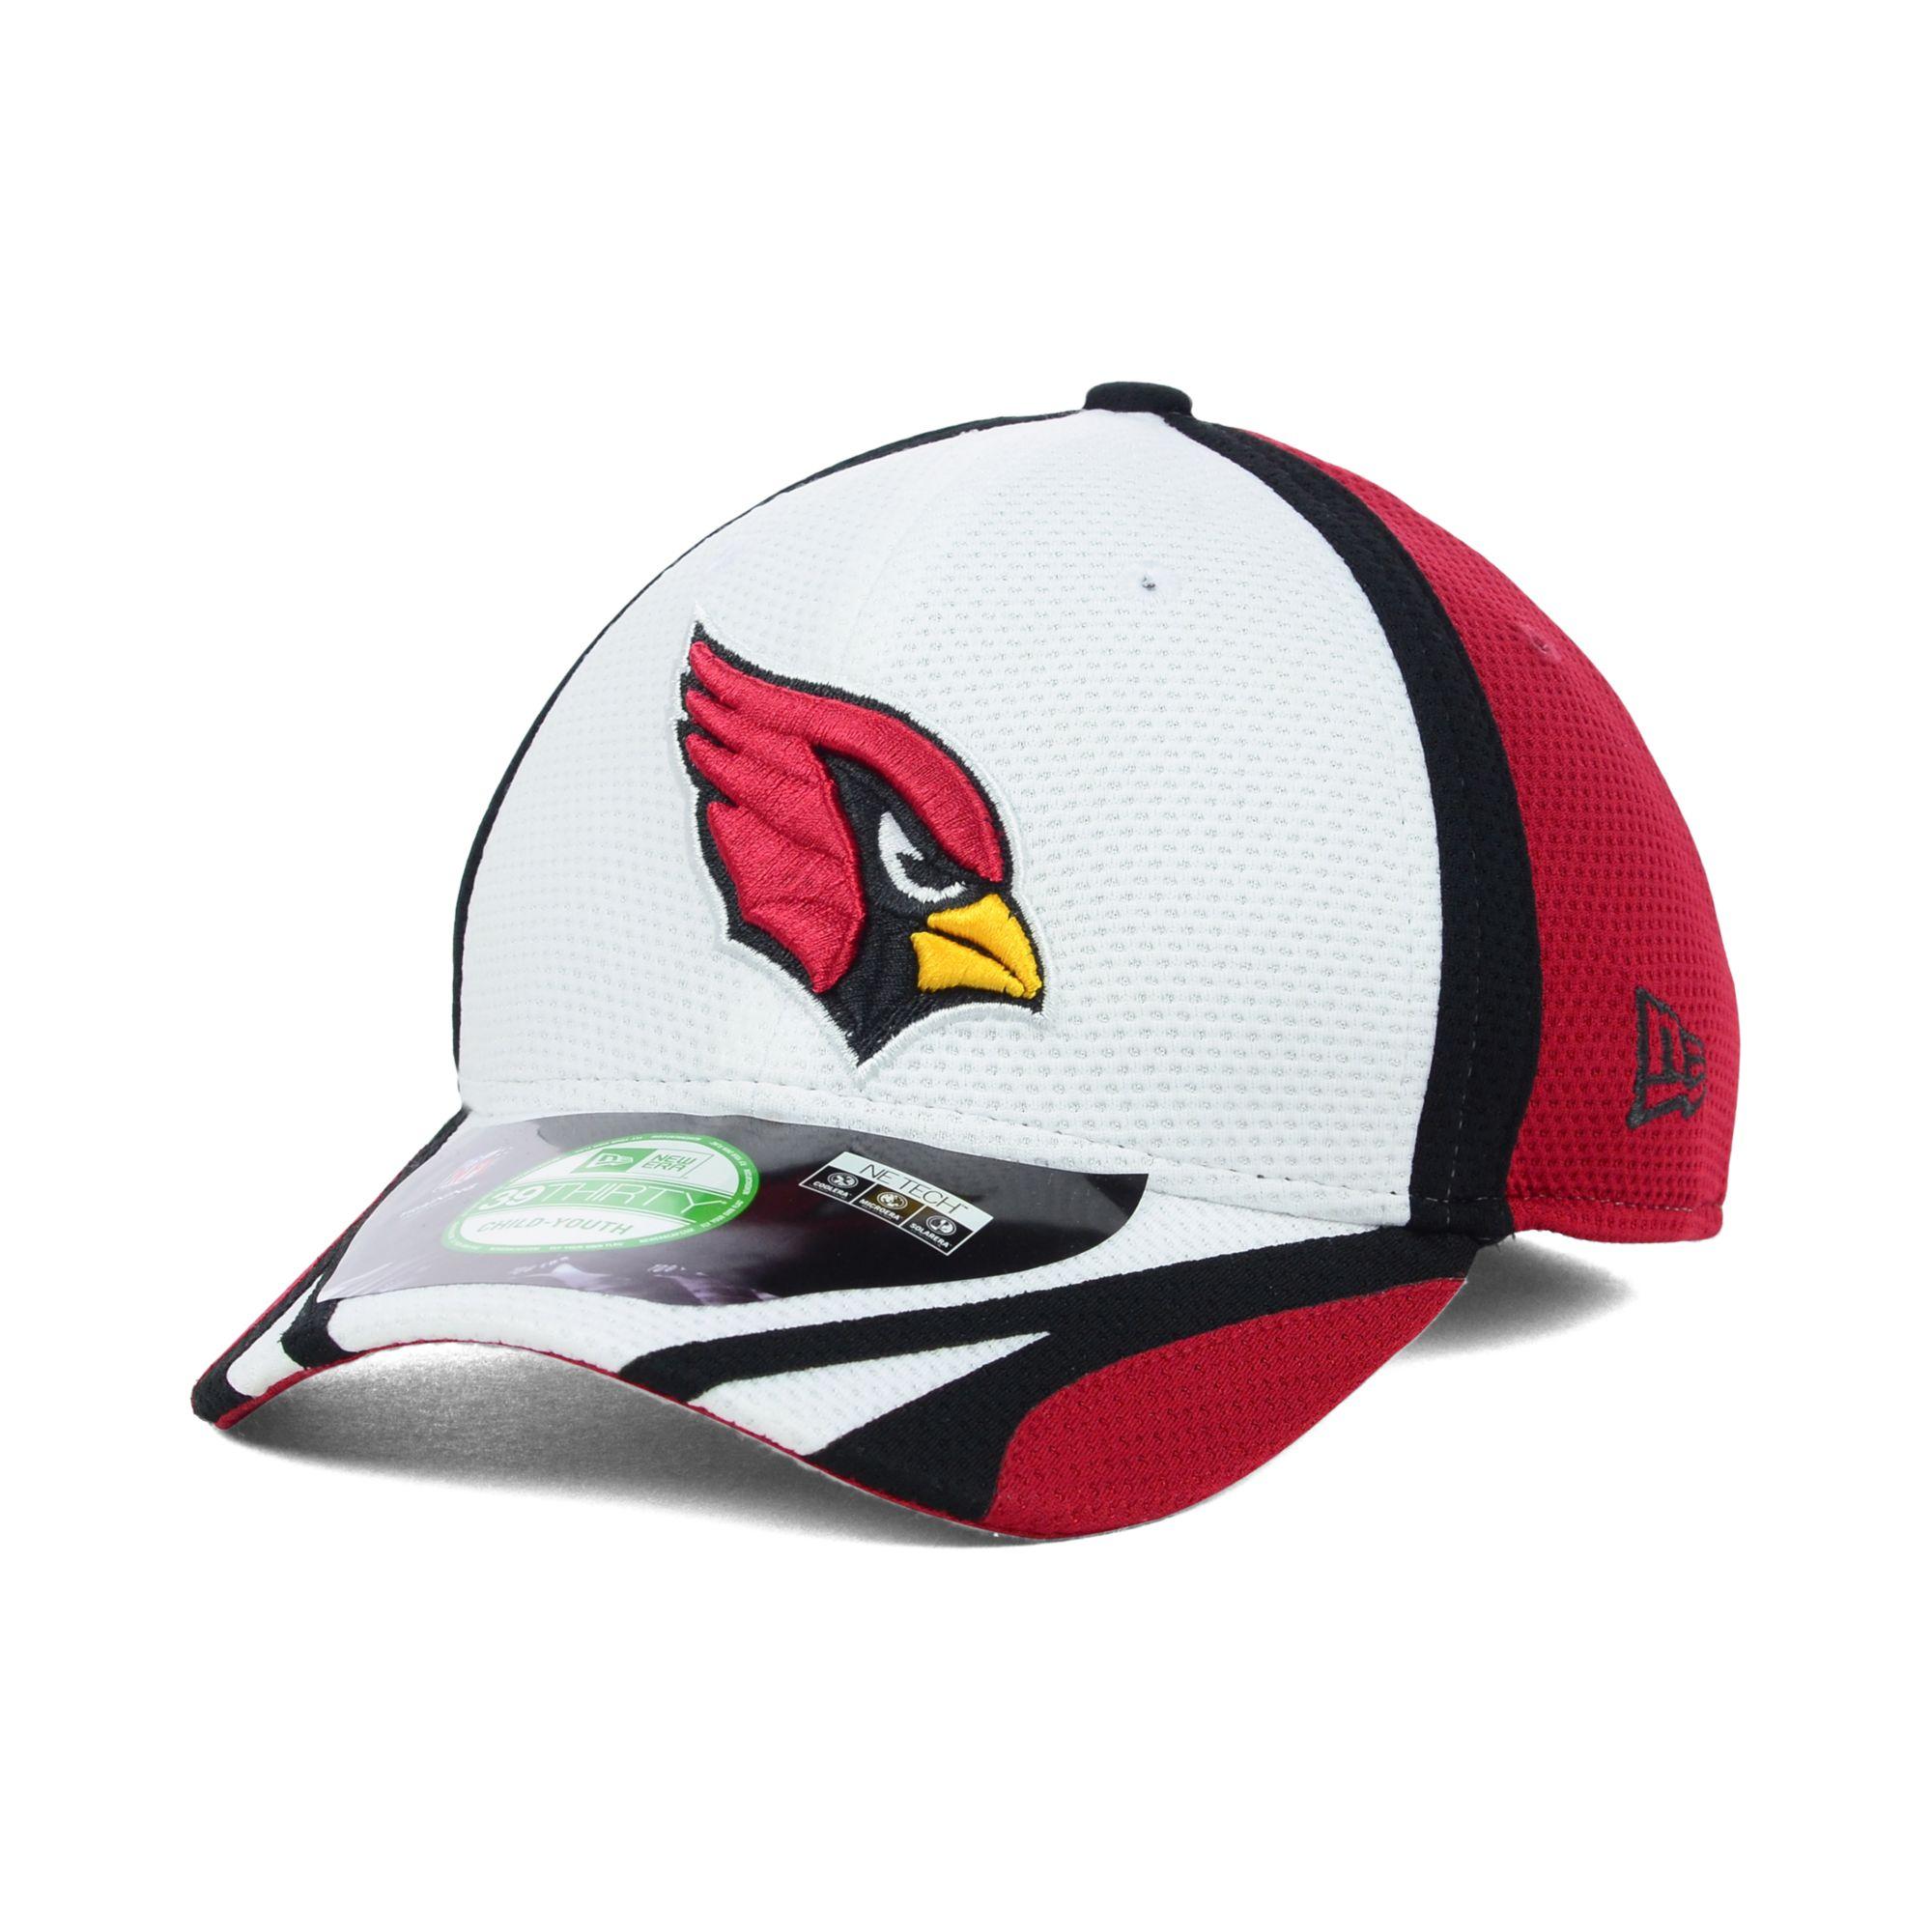 4c2a538b0 Lyst - Ktz Arizona Cardinals Training Camp 39thirty Kids Cap Or ...